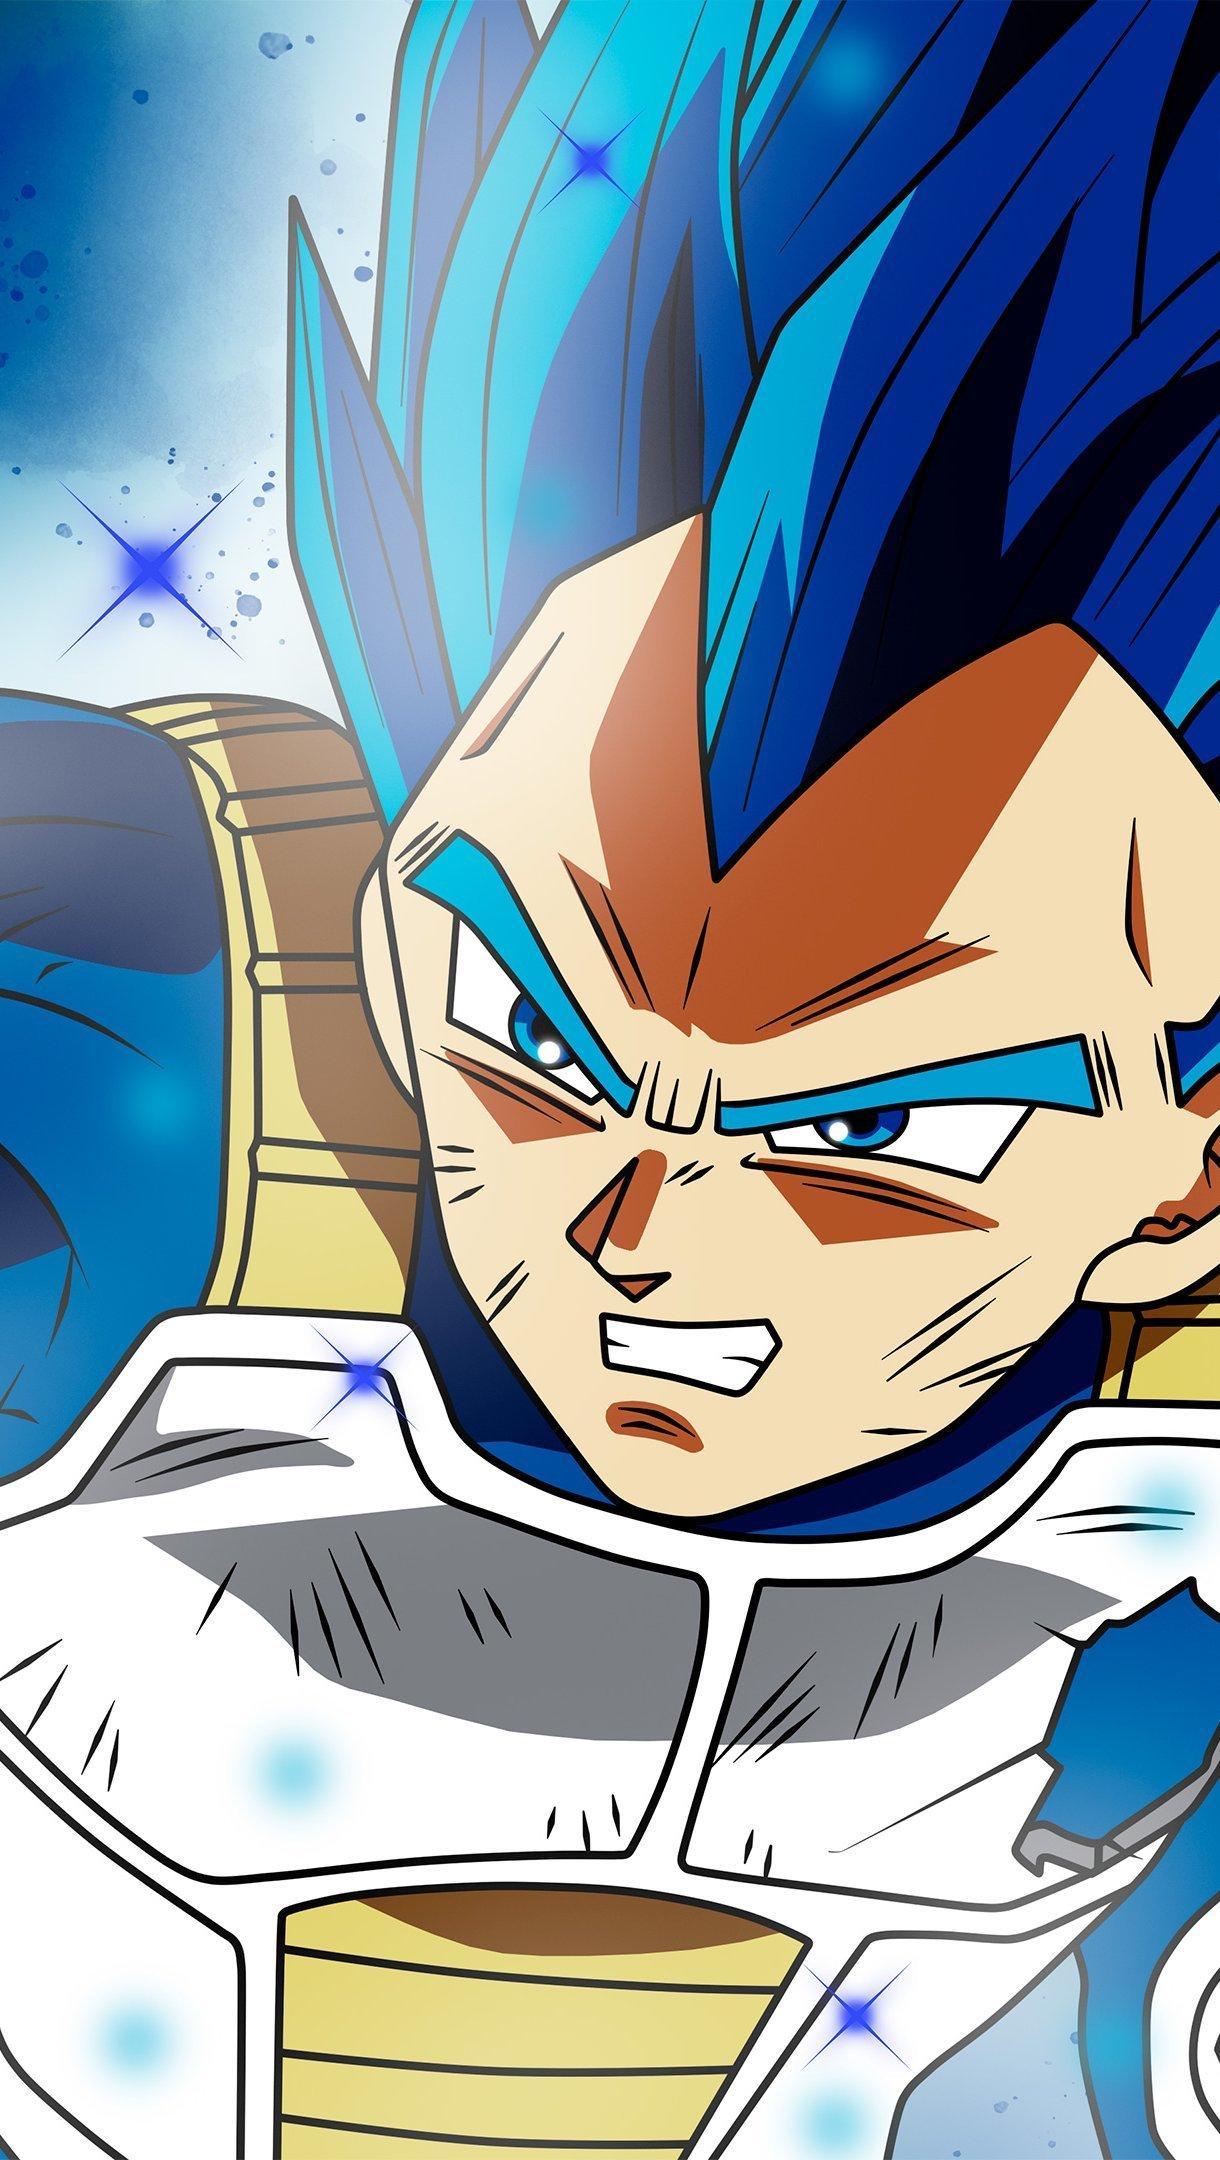 Vegeta Dragon Ball Super Anime Wallpaper 4k Ultra Hd Id 3437